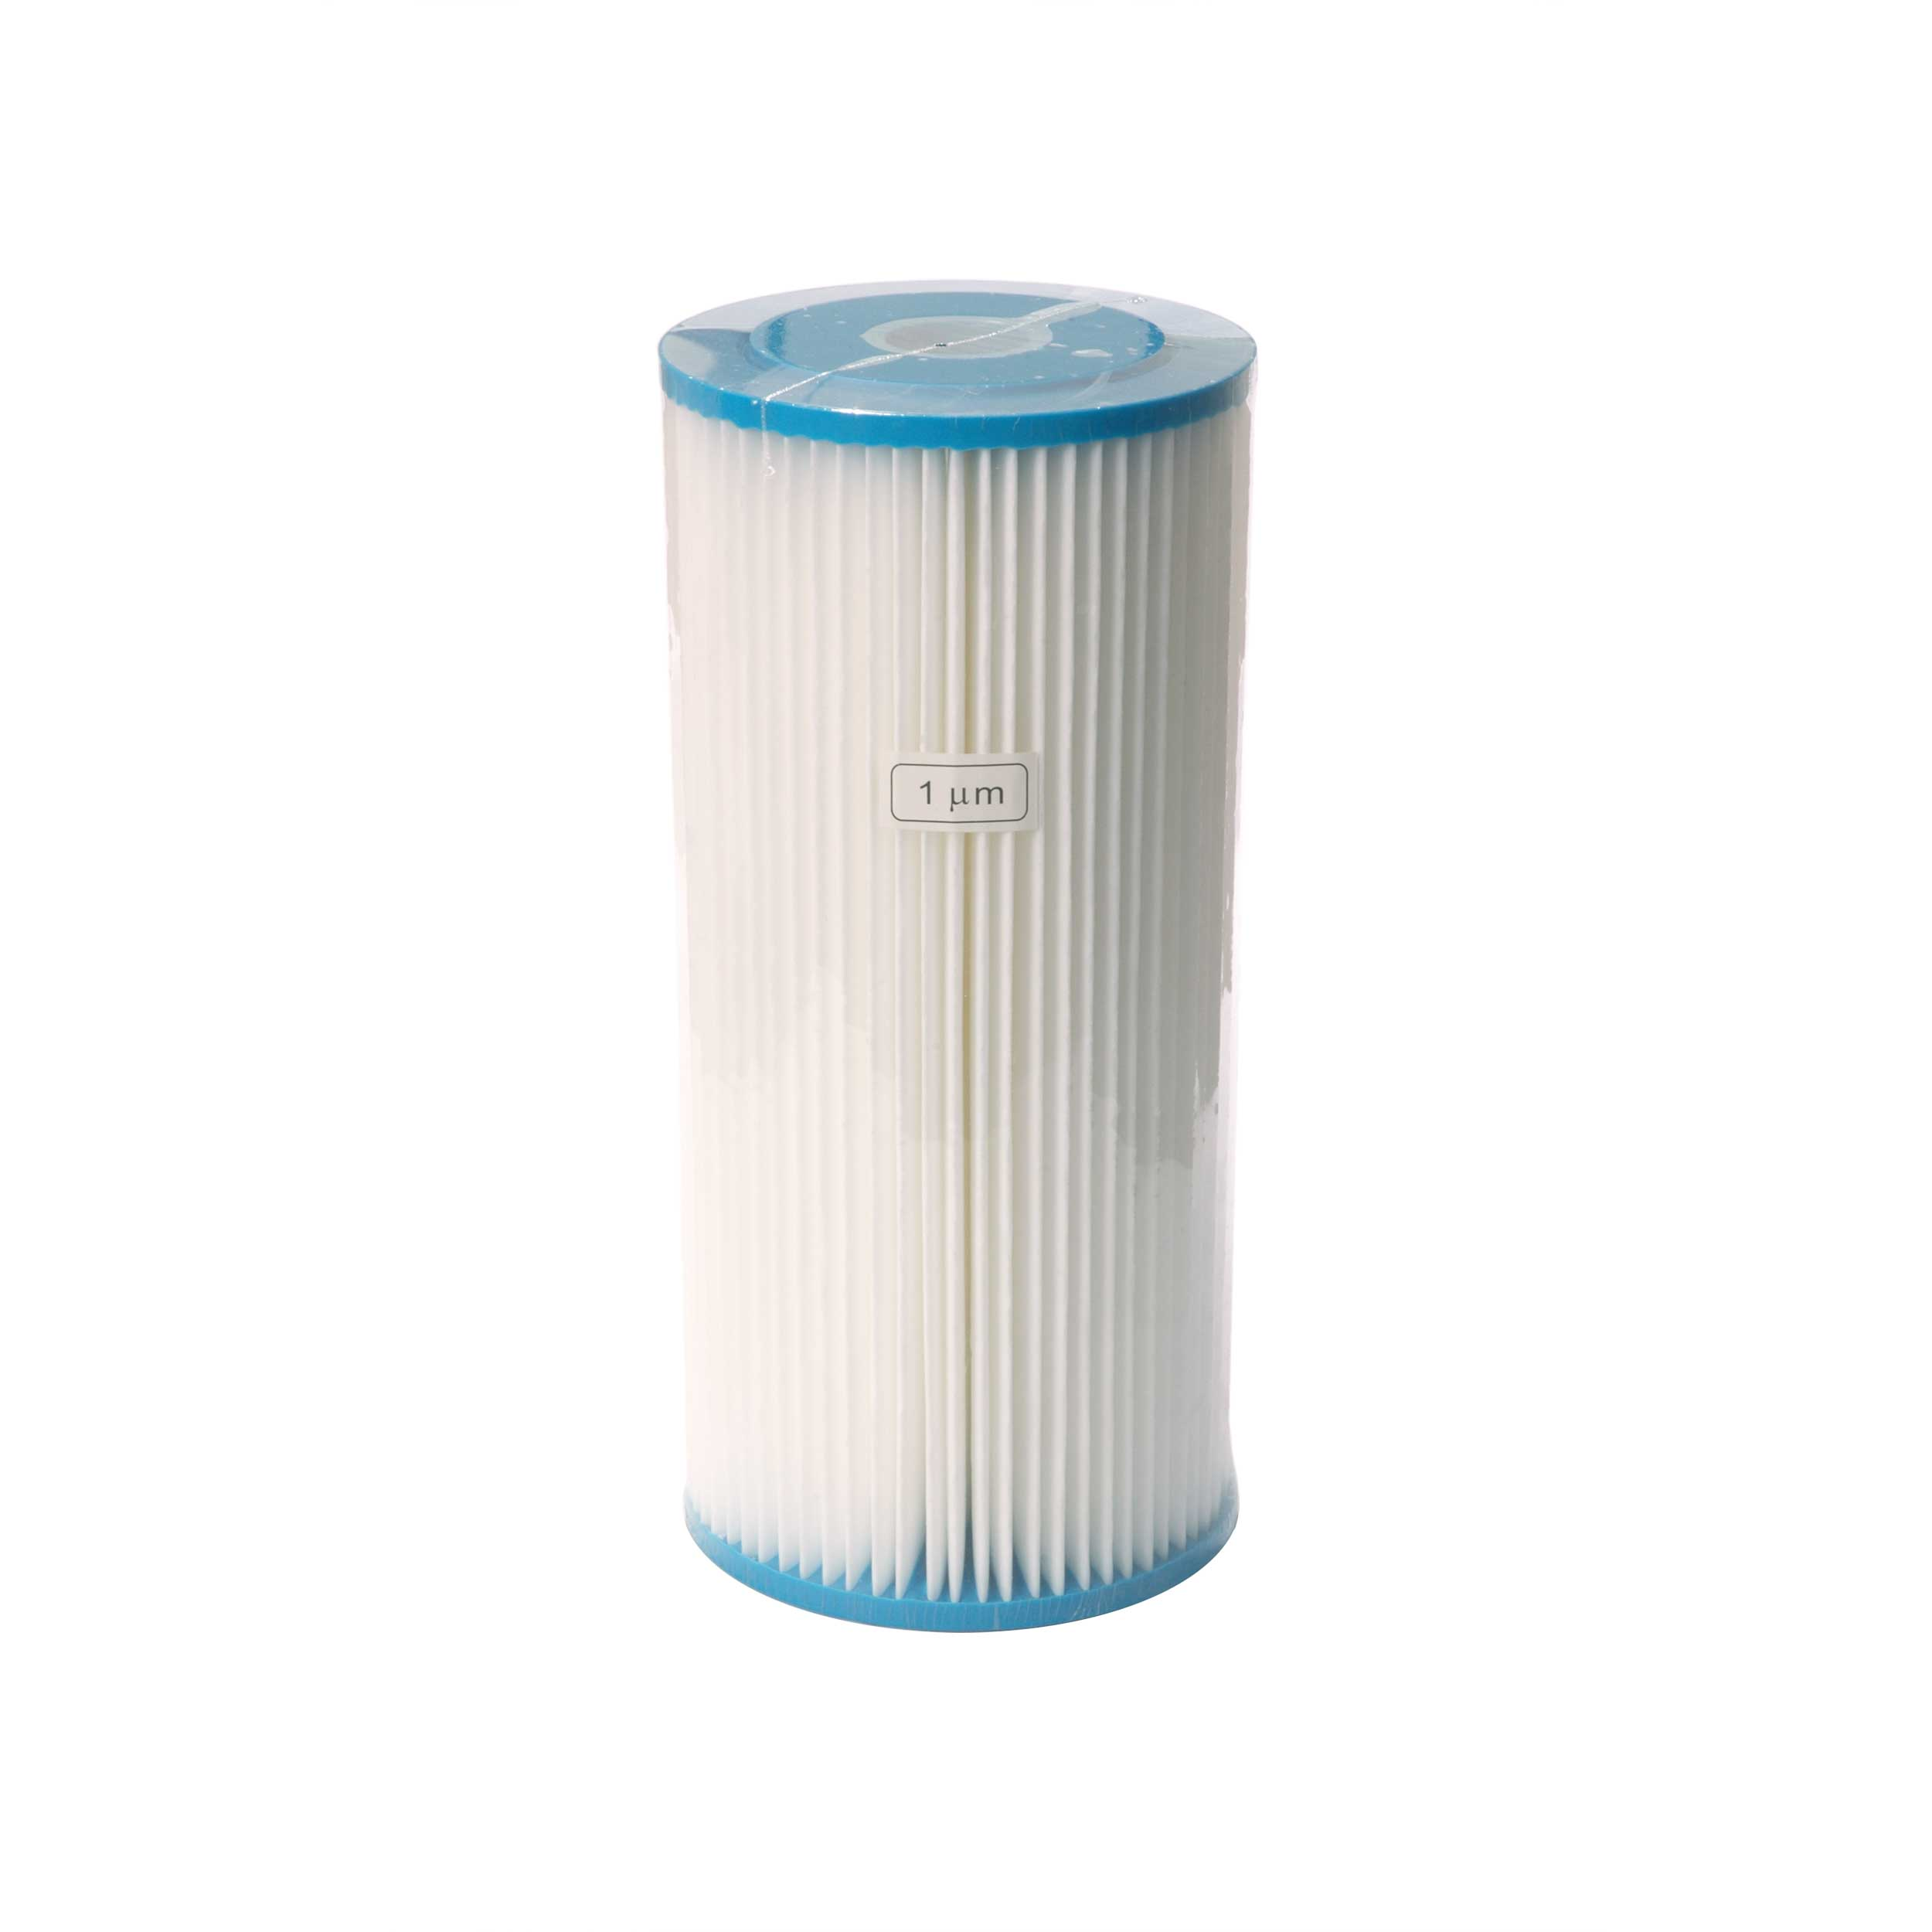 Replacement Cartridges replacement water filter cartridges, Free UK ...